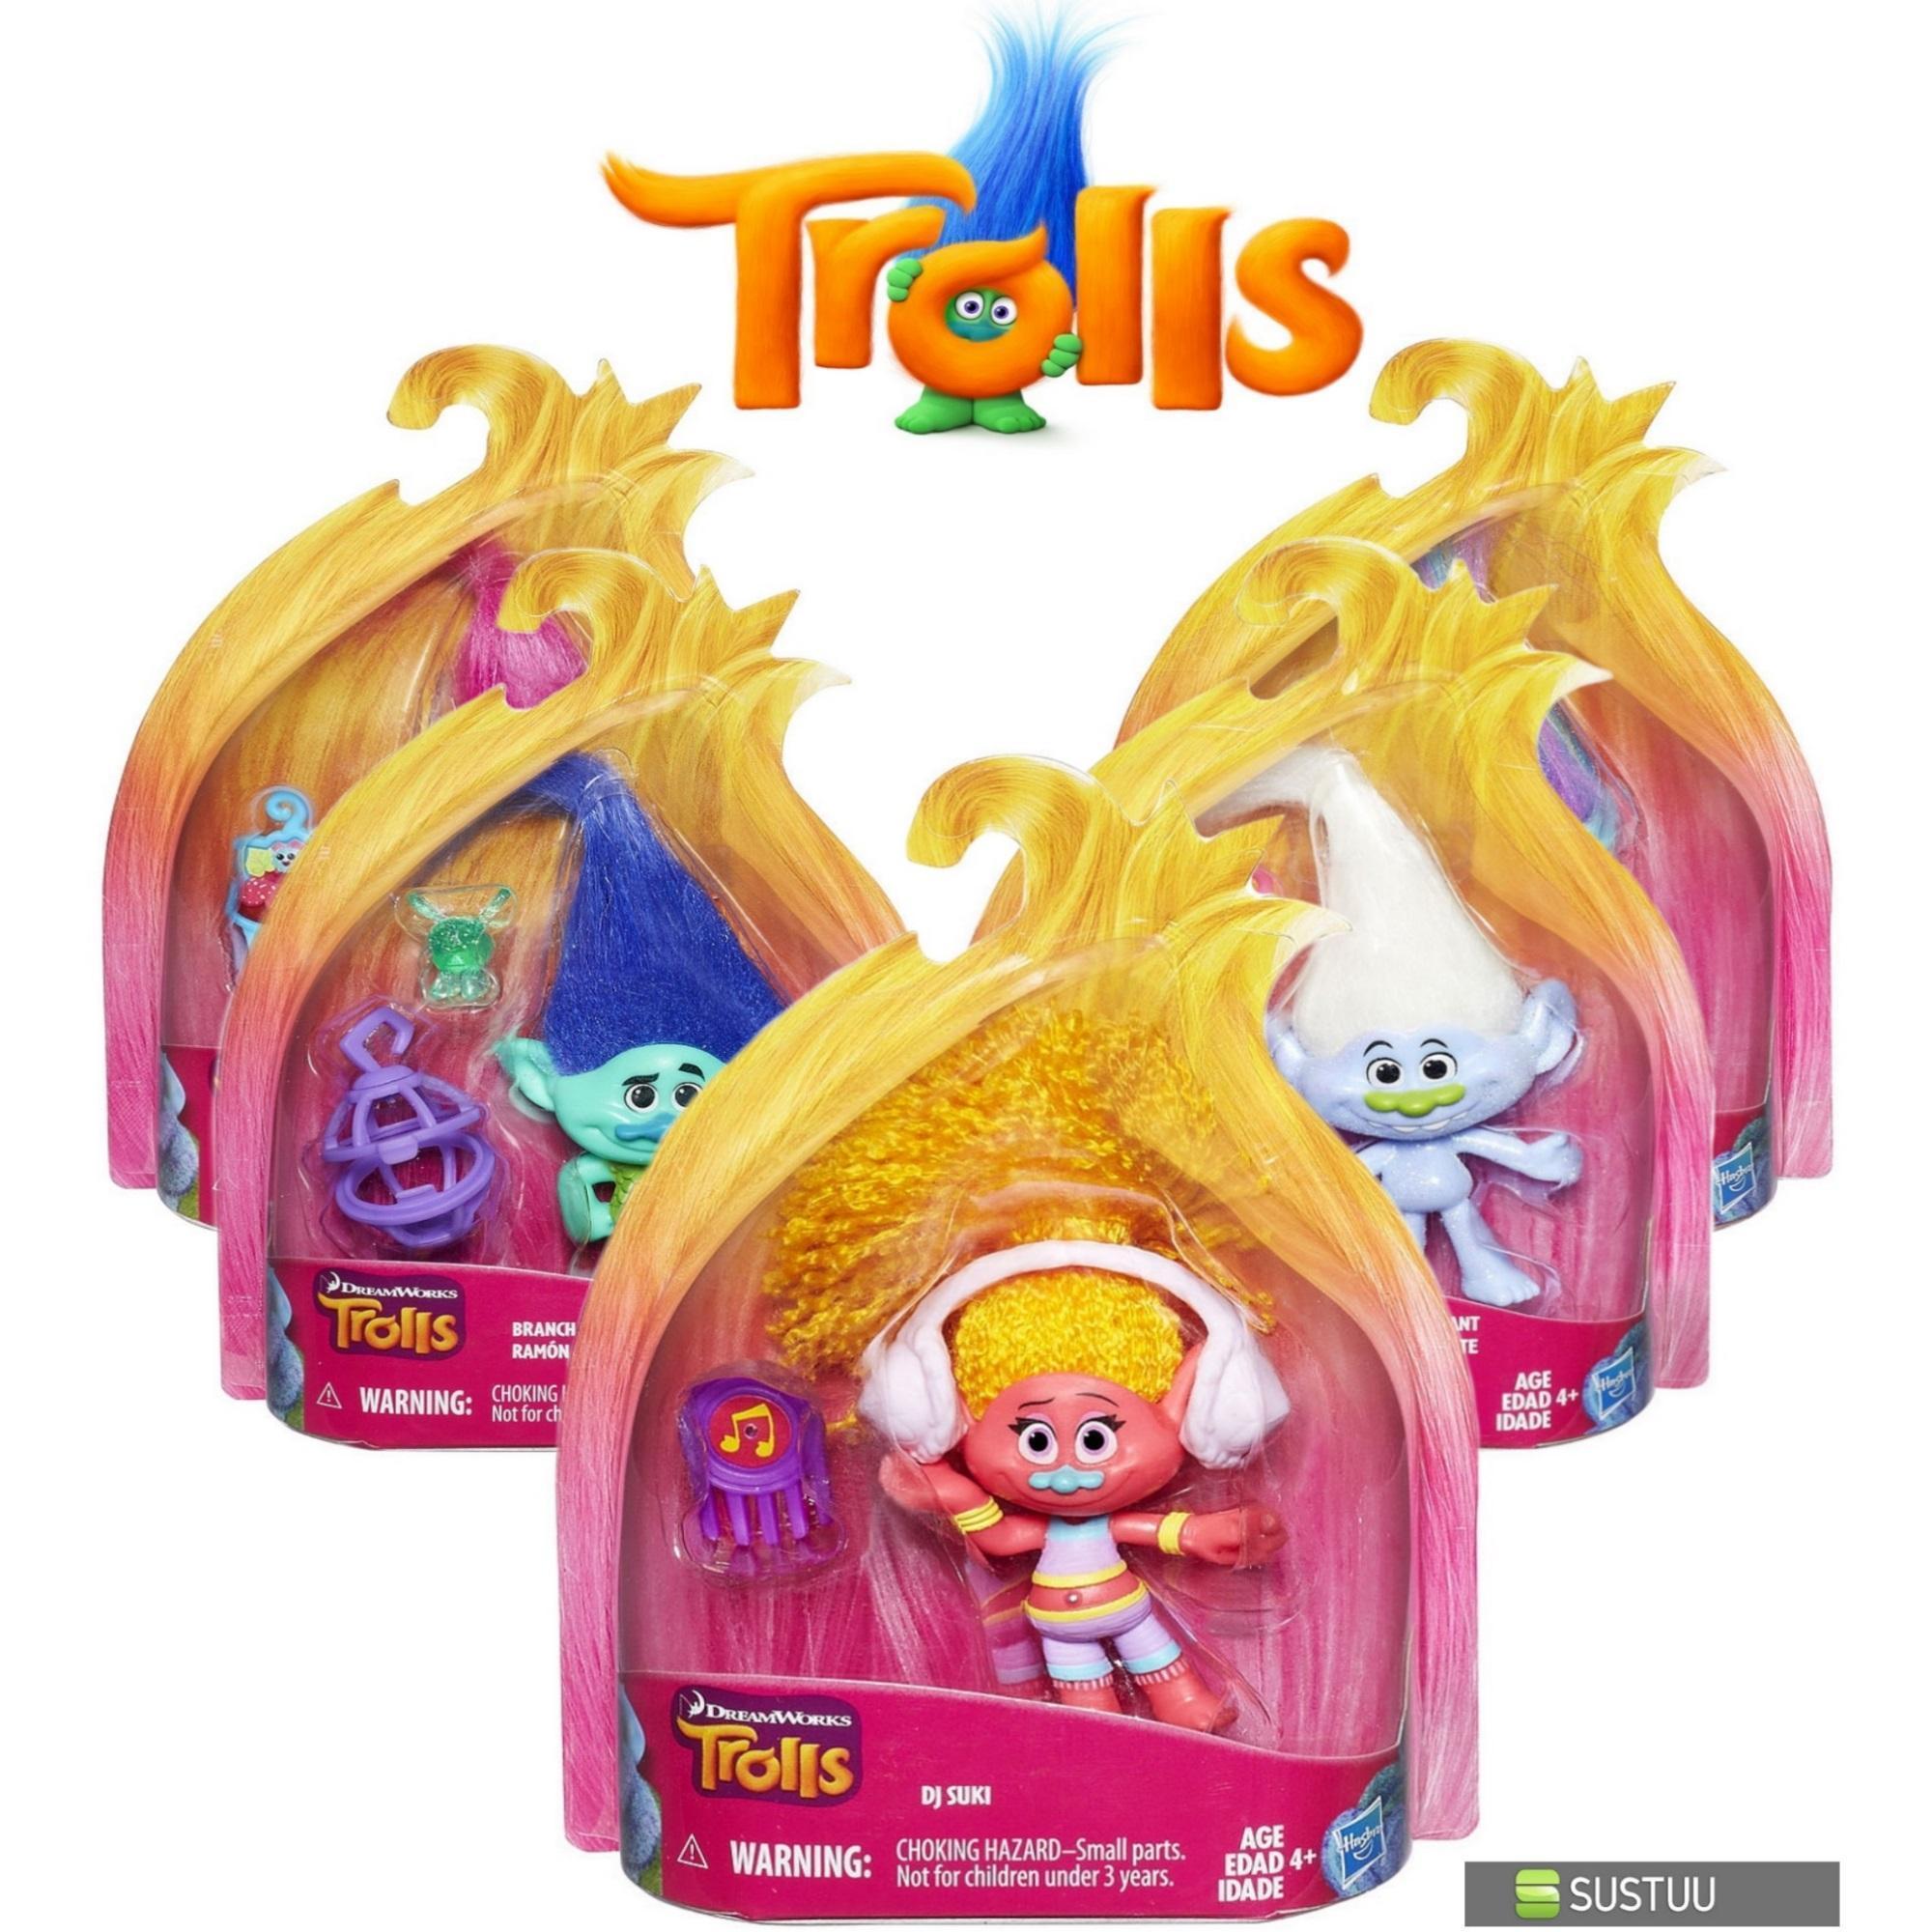 Hasbro Dreamworks Trolls Kids Collectable Figure Fun Girls Dress Up Toy 4 inch